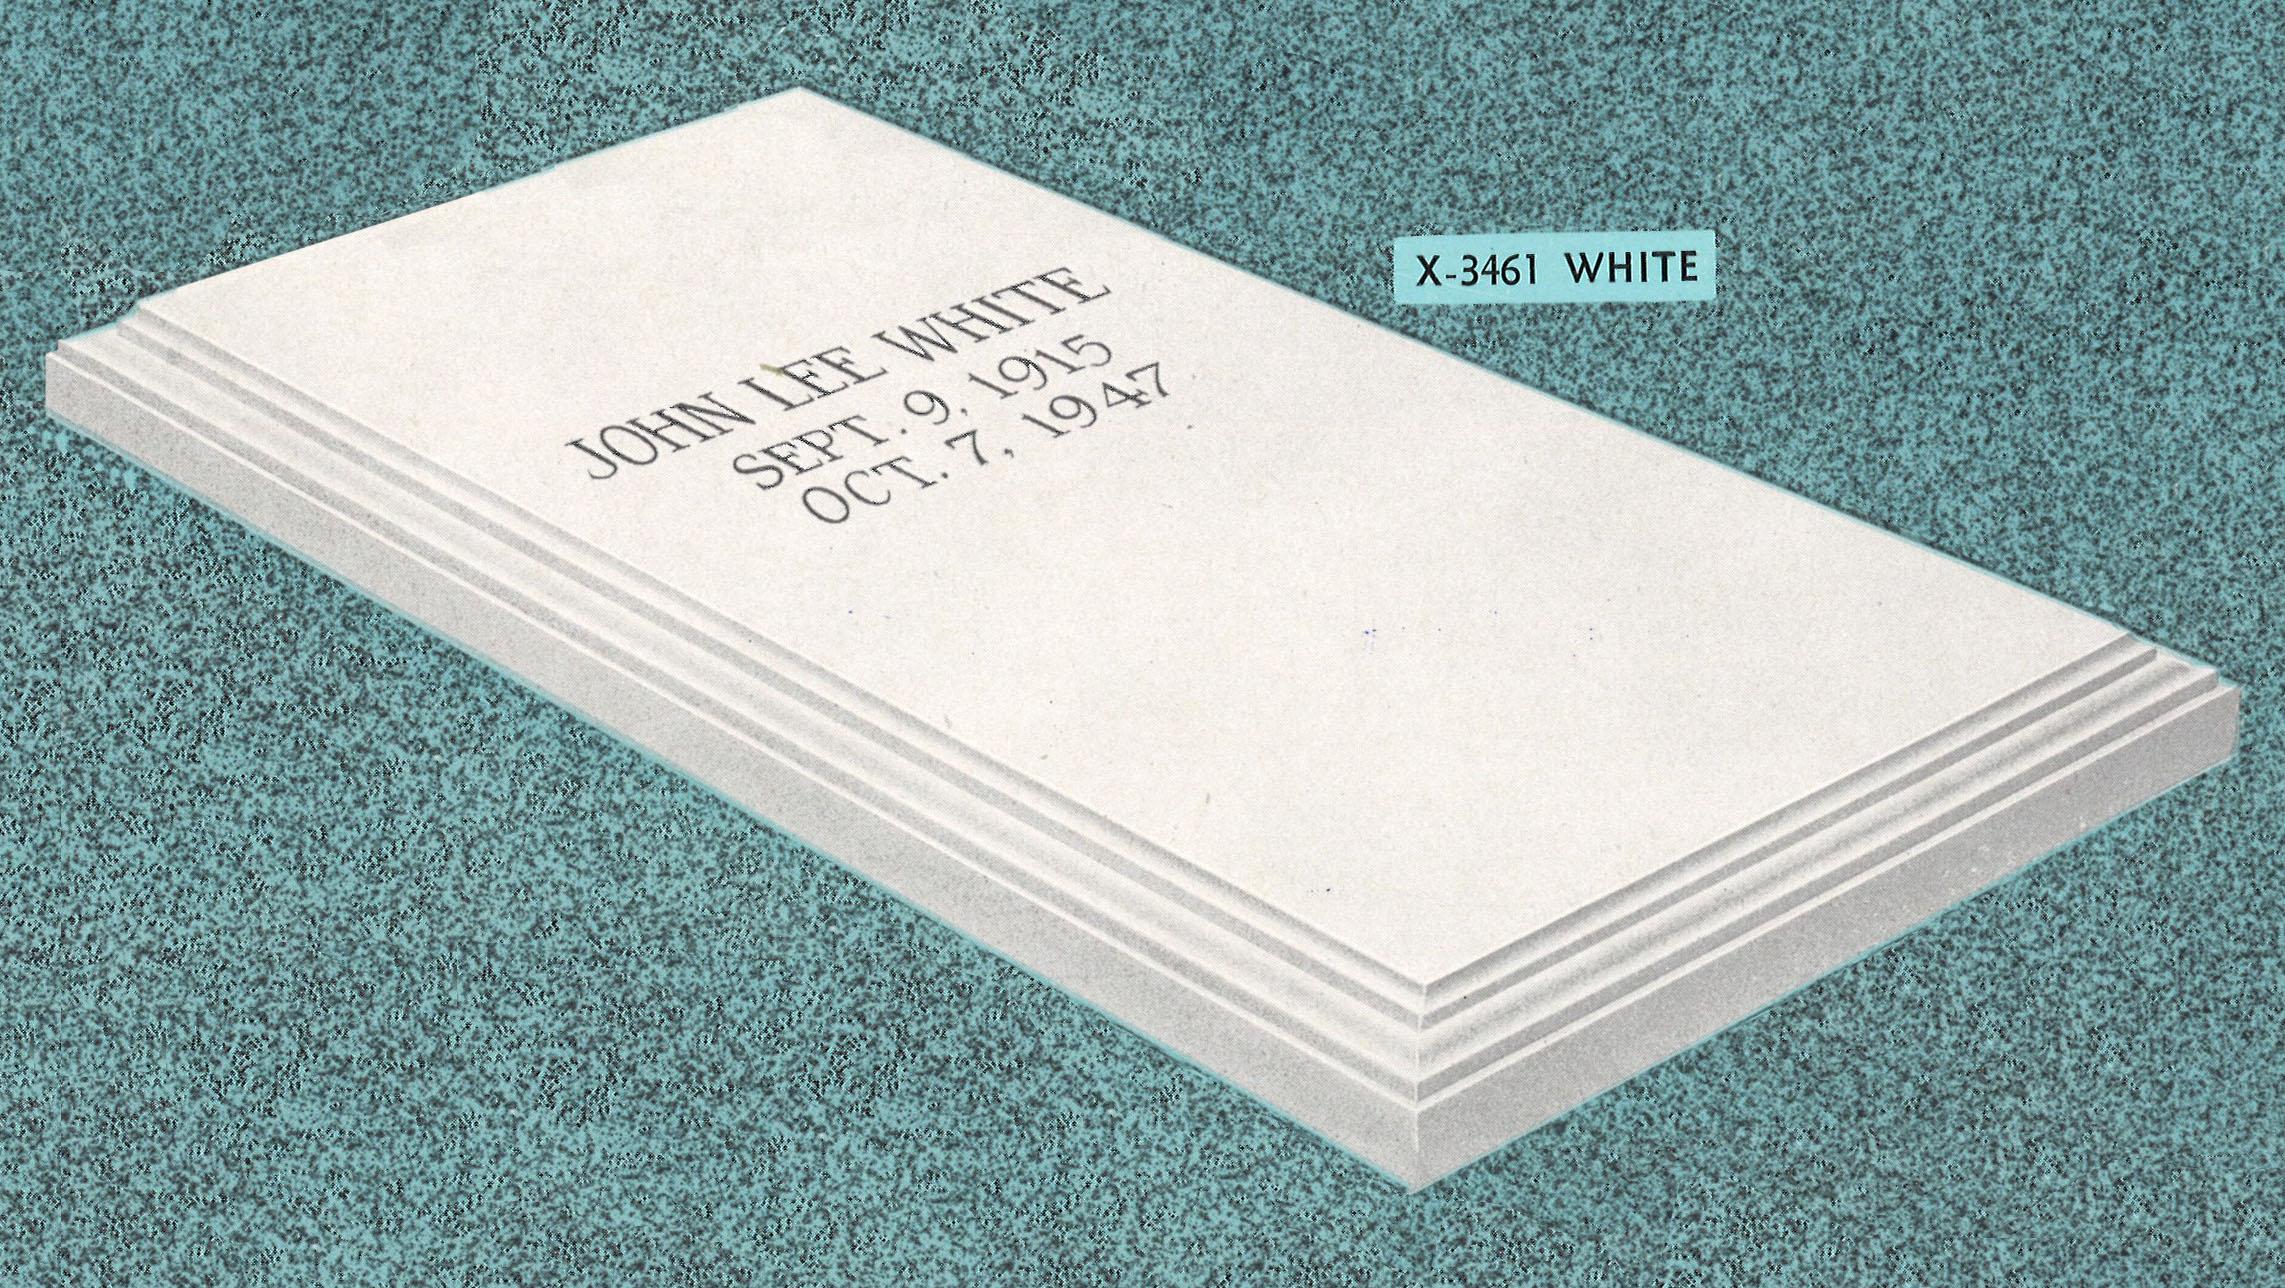 X-3461 White